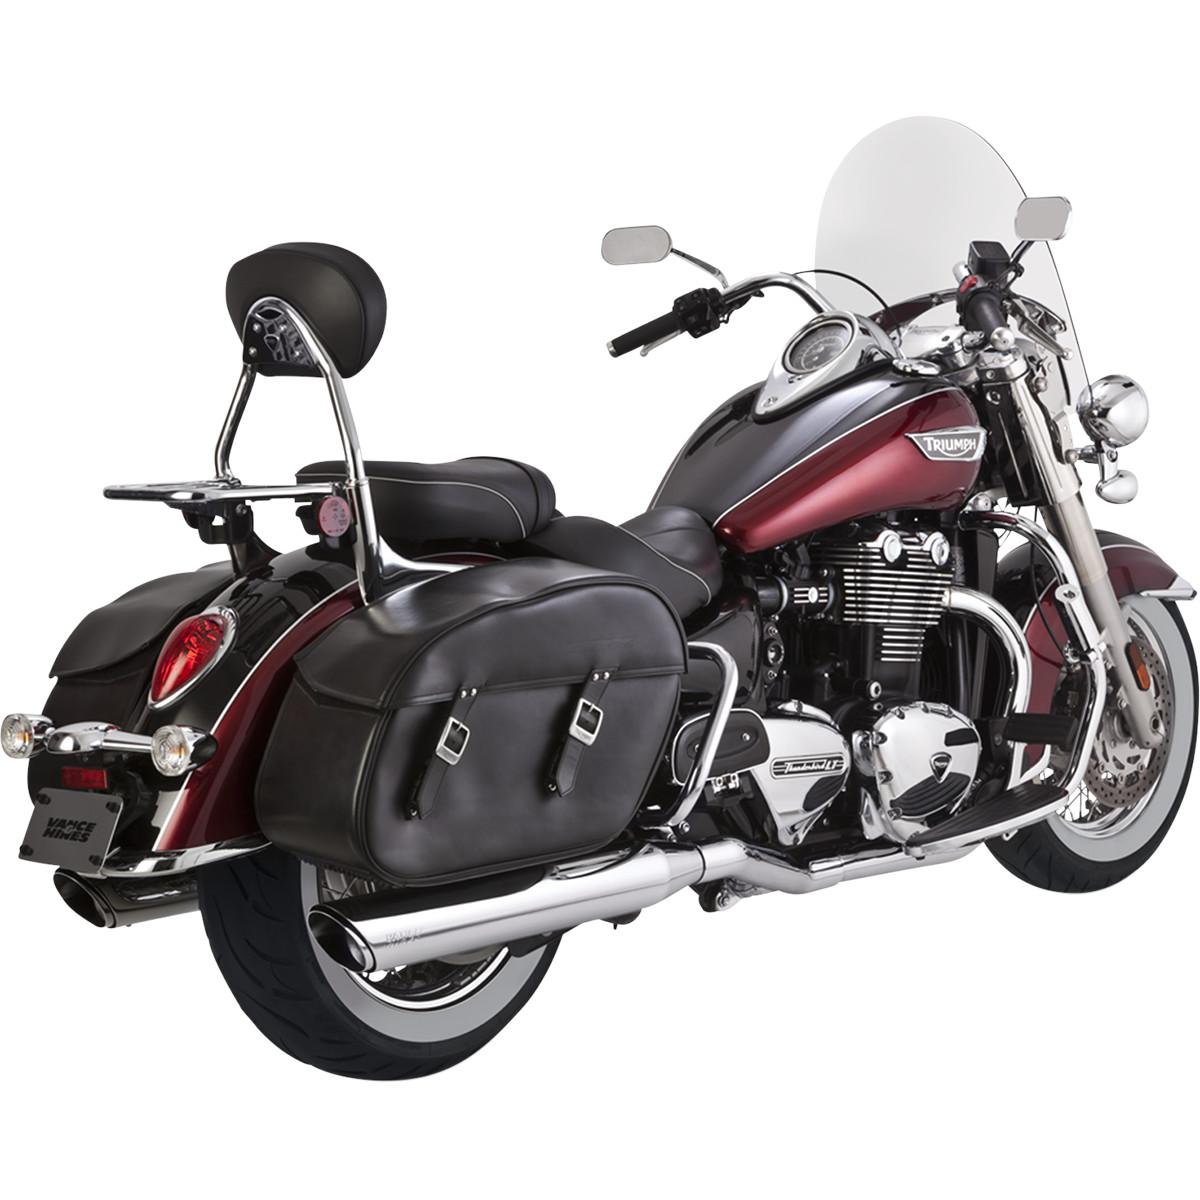 Vance & Hines Twin Slash Duals Thunderbird LT/Commander: 1810-2350